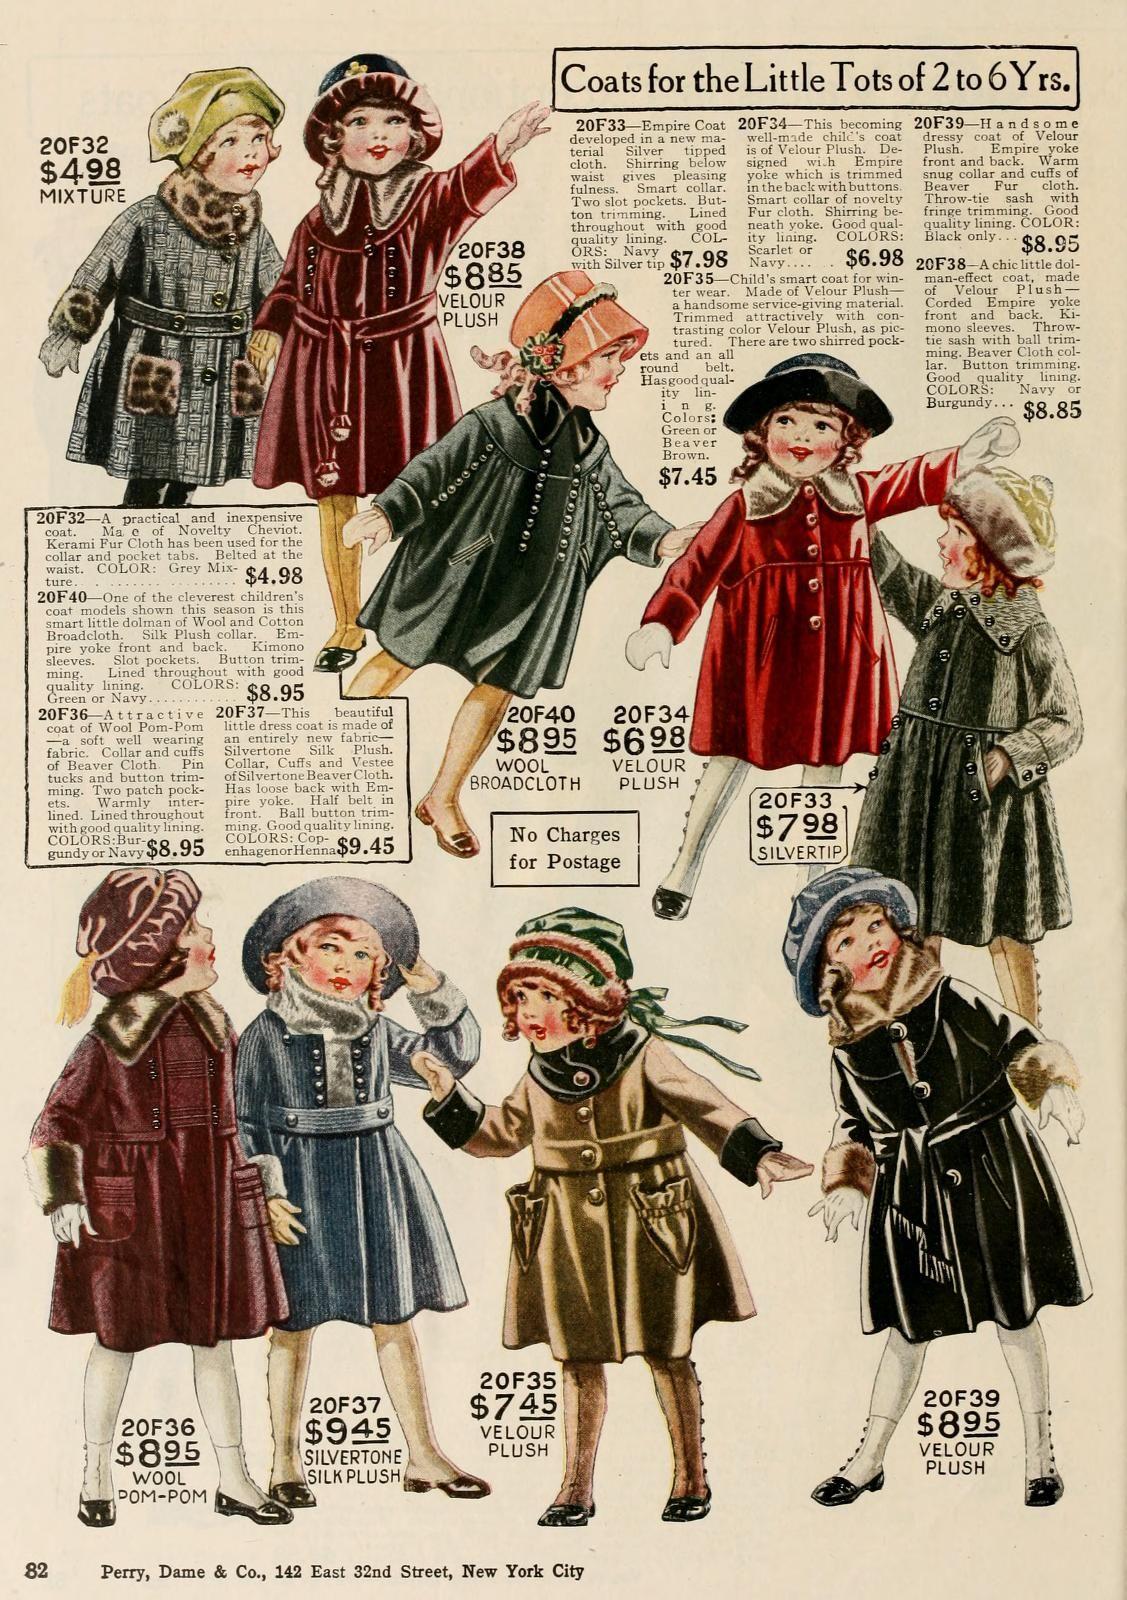 1920s Children's Fashion